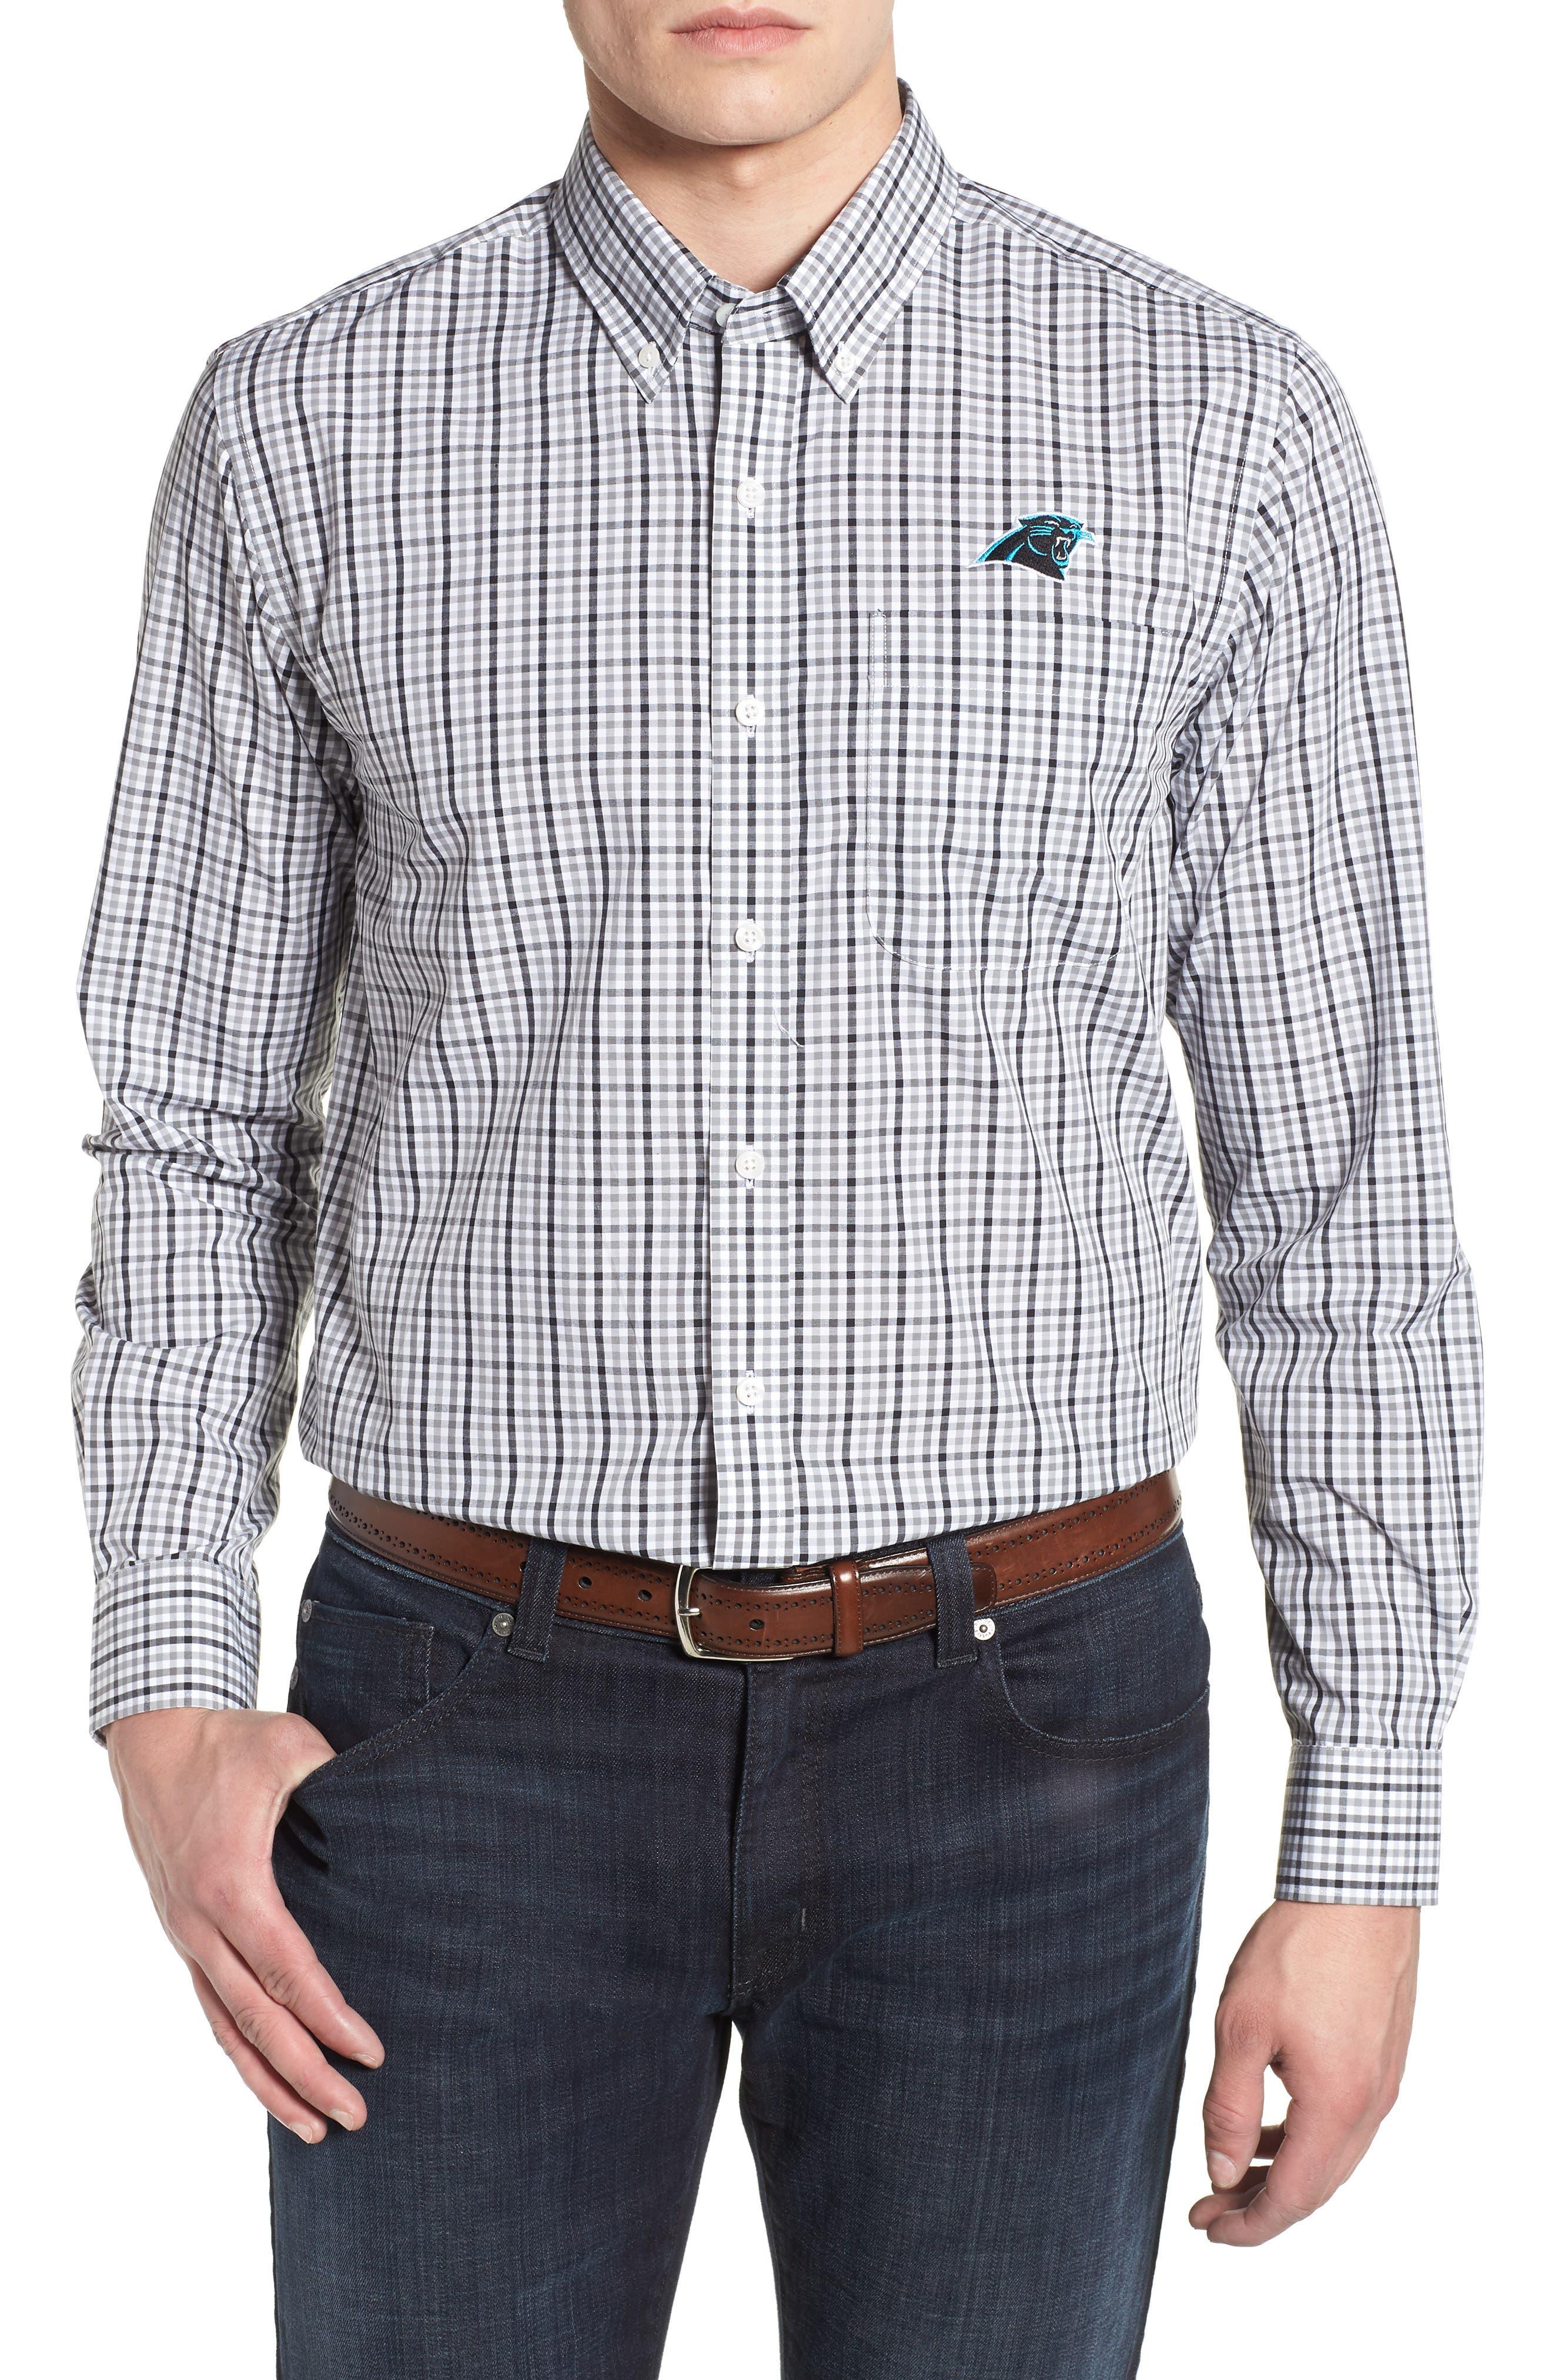 Carolina Panthers - Gilman Regular Fit Plaid Sport Shirt,                             Main thumbnail 1, color,                             BLACK